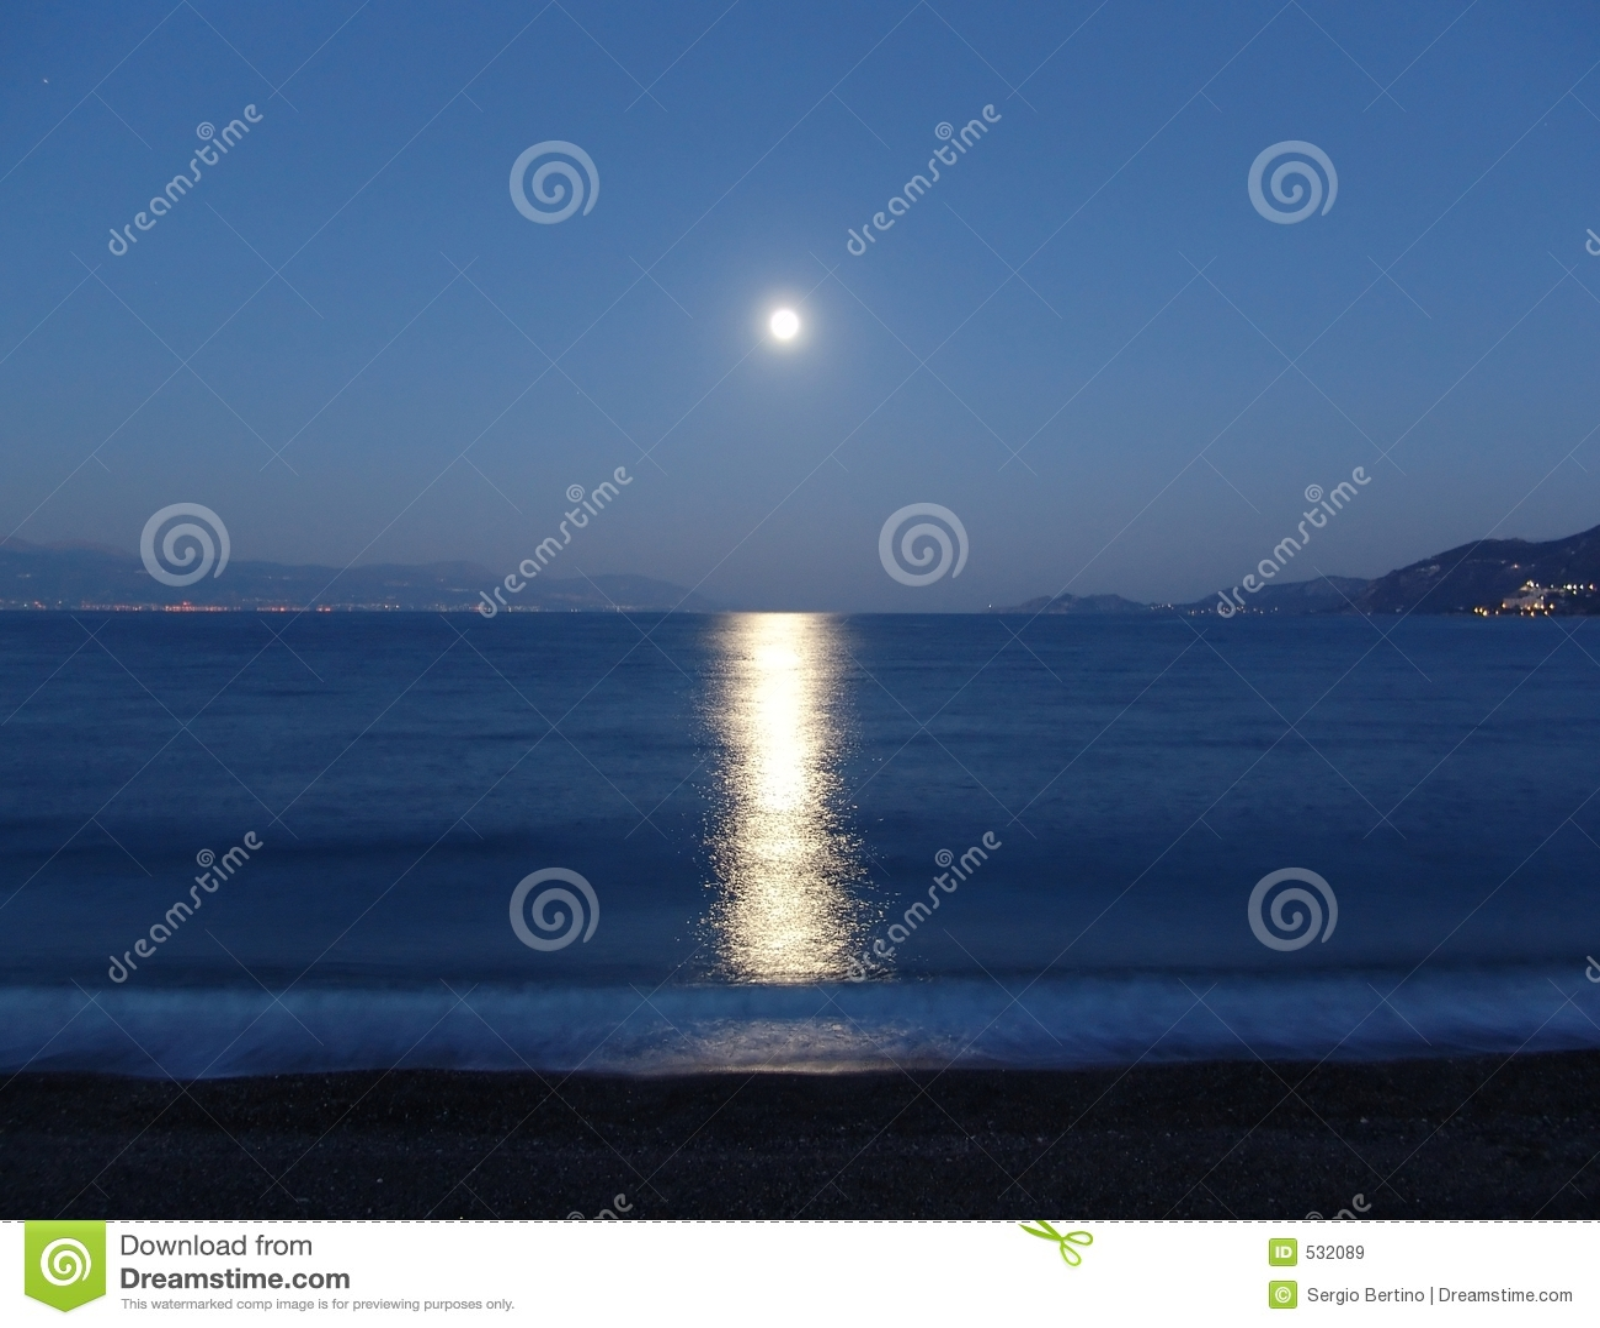 Download 浪漫的月光 库存图片. 图片 包括有 晚上, 雅典, 希腊, 月光, 华伦泰, 浪漫, 夏天, 节假日, 假期 - 532089